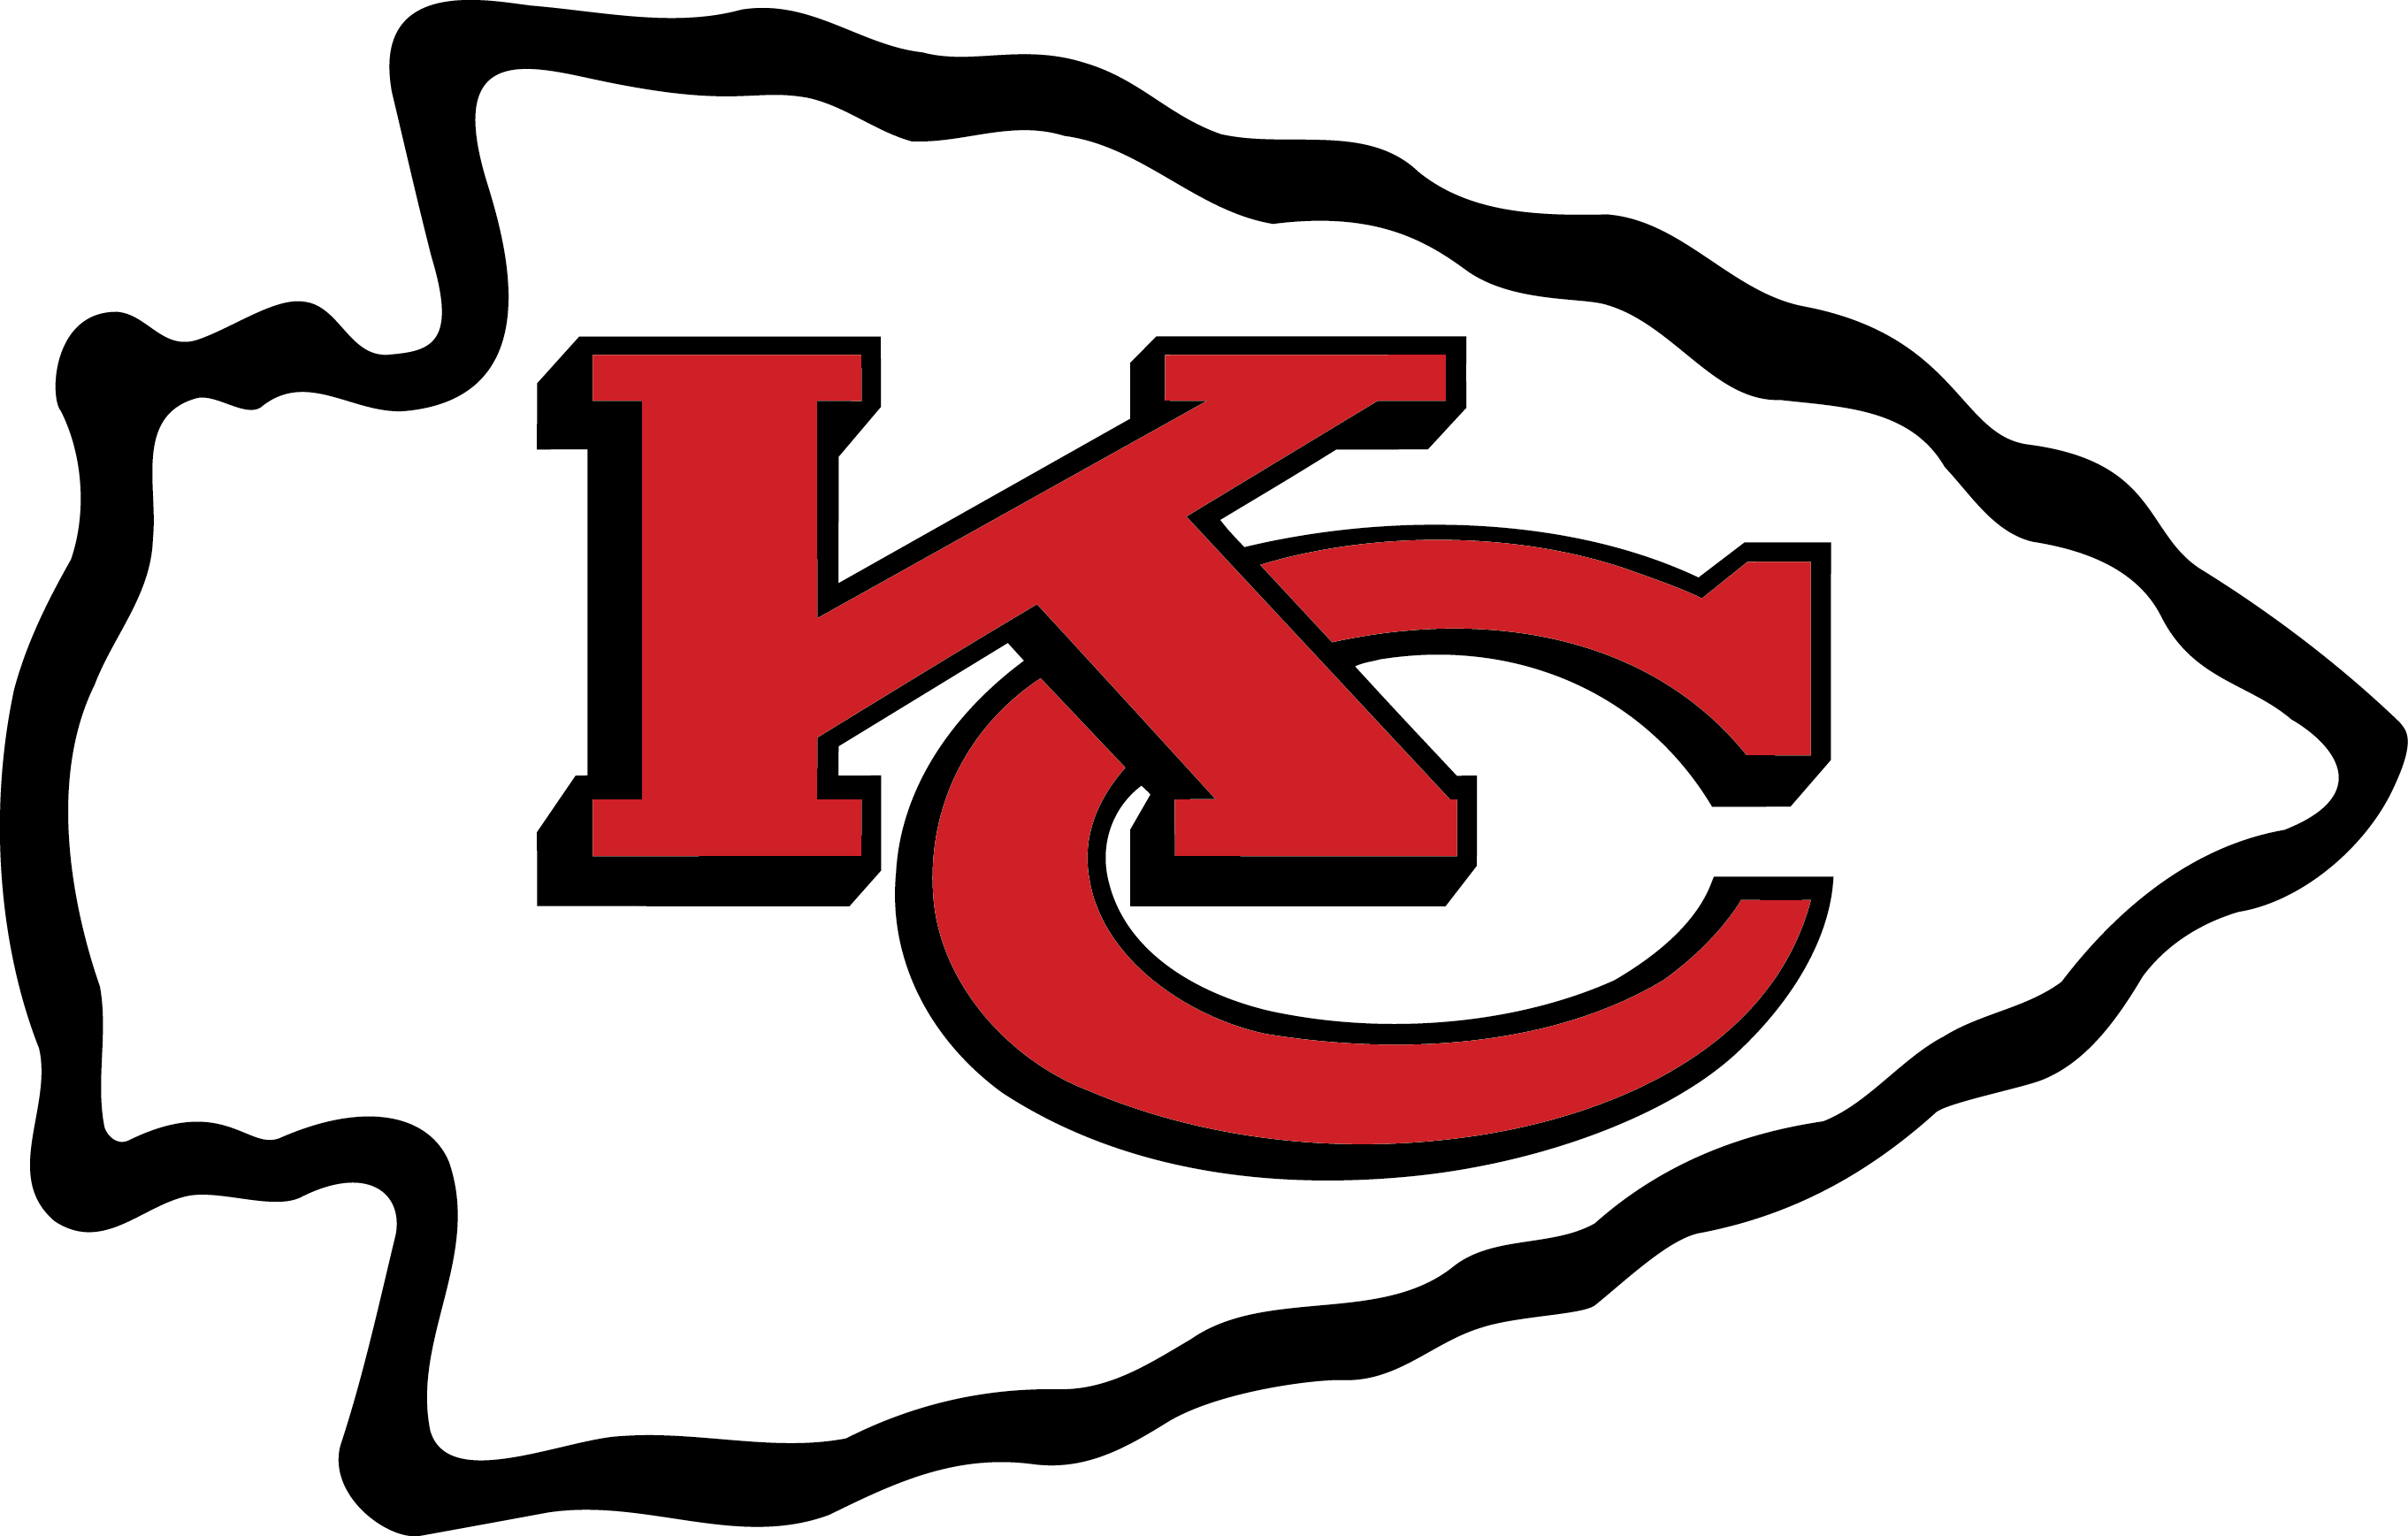 Png kansas state logo clipart clipart library stock Kansas City Chiefs Logo Vector EPS Free Download, Logo, Icons ... clipart library stock